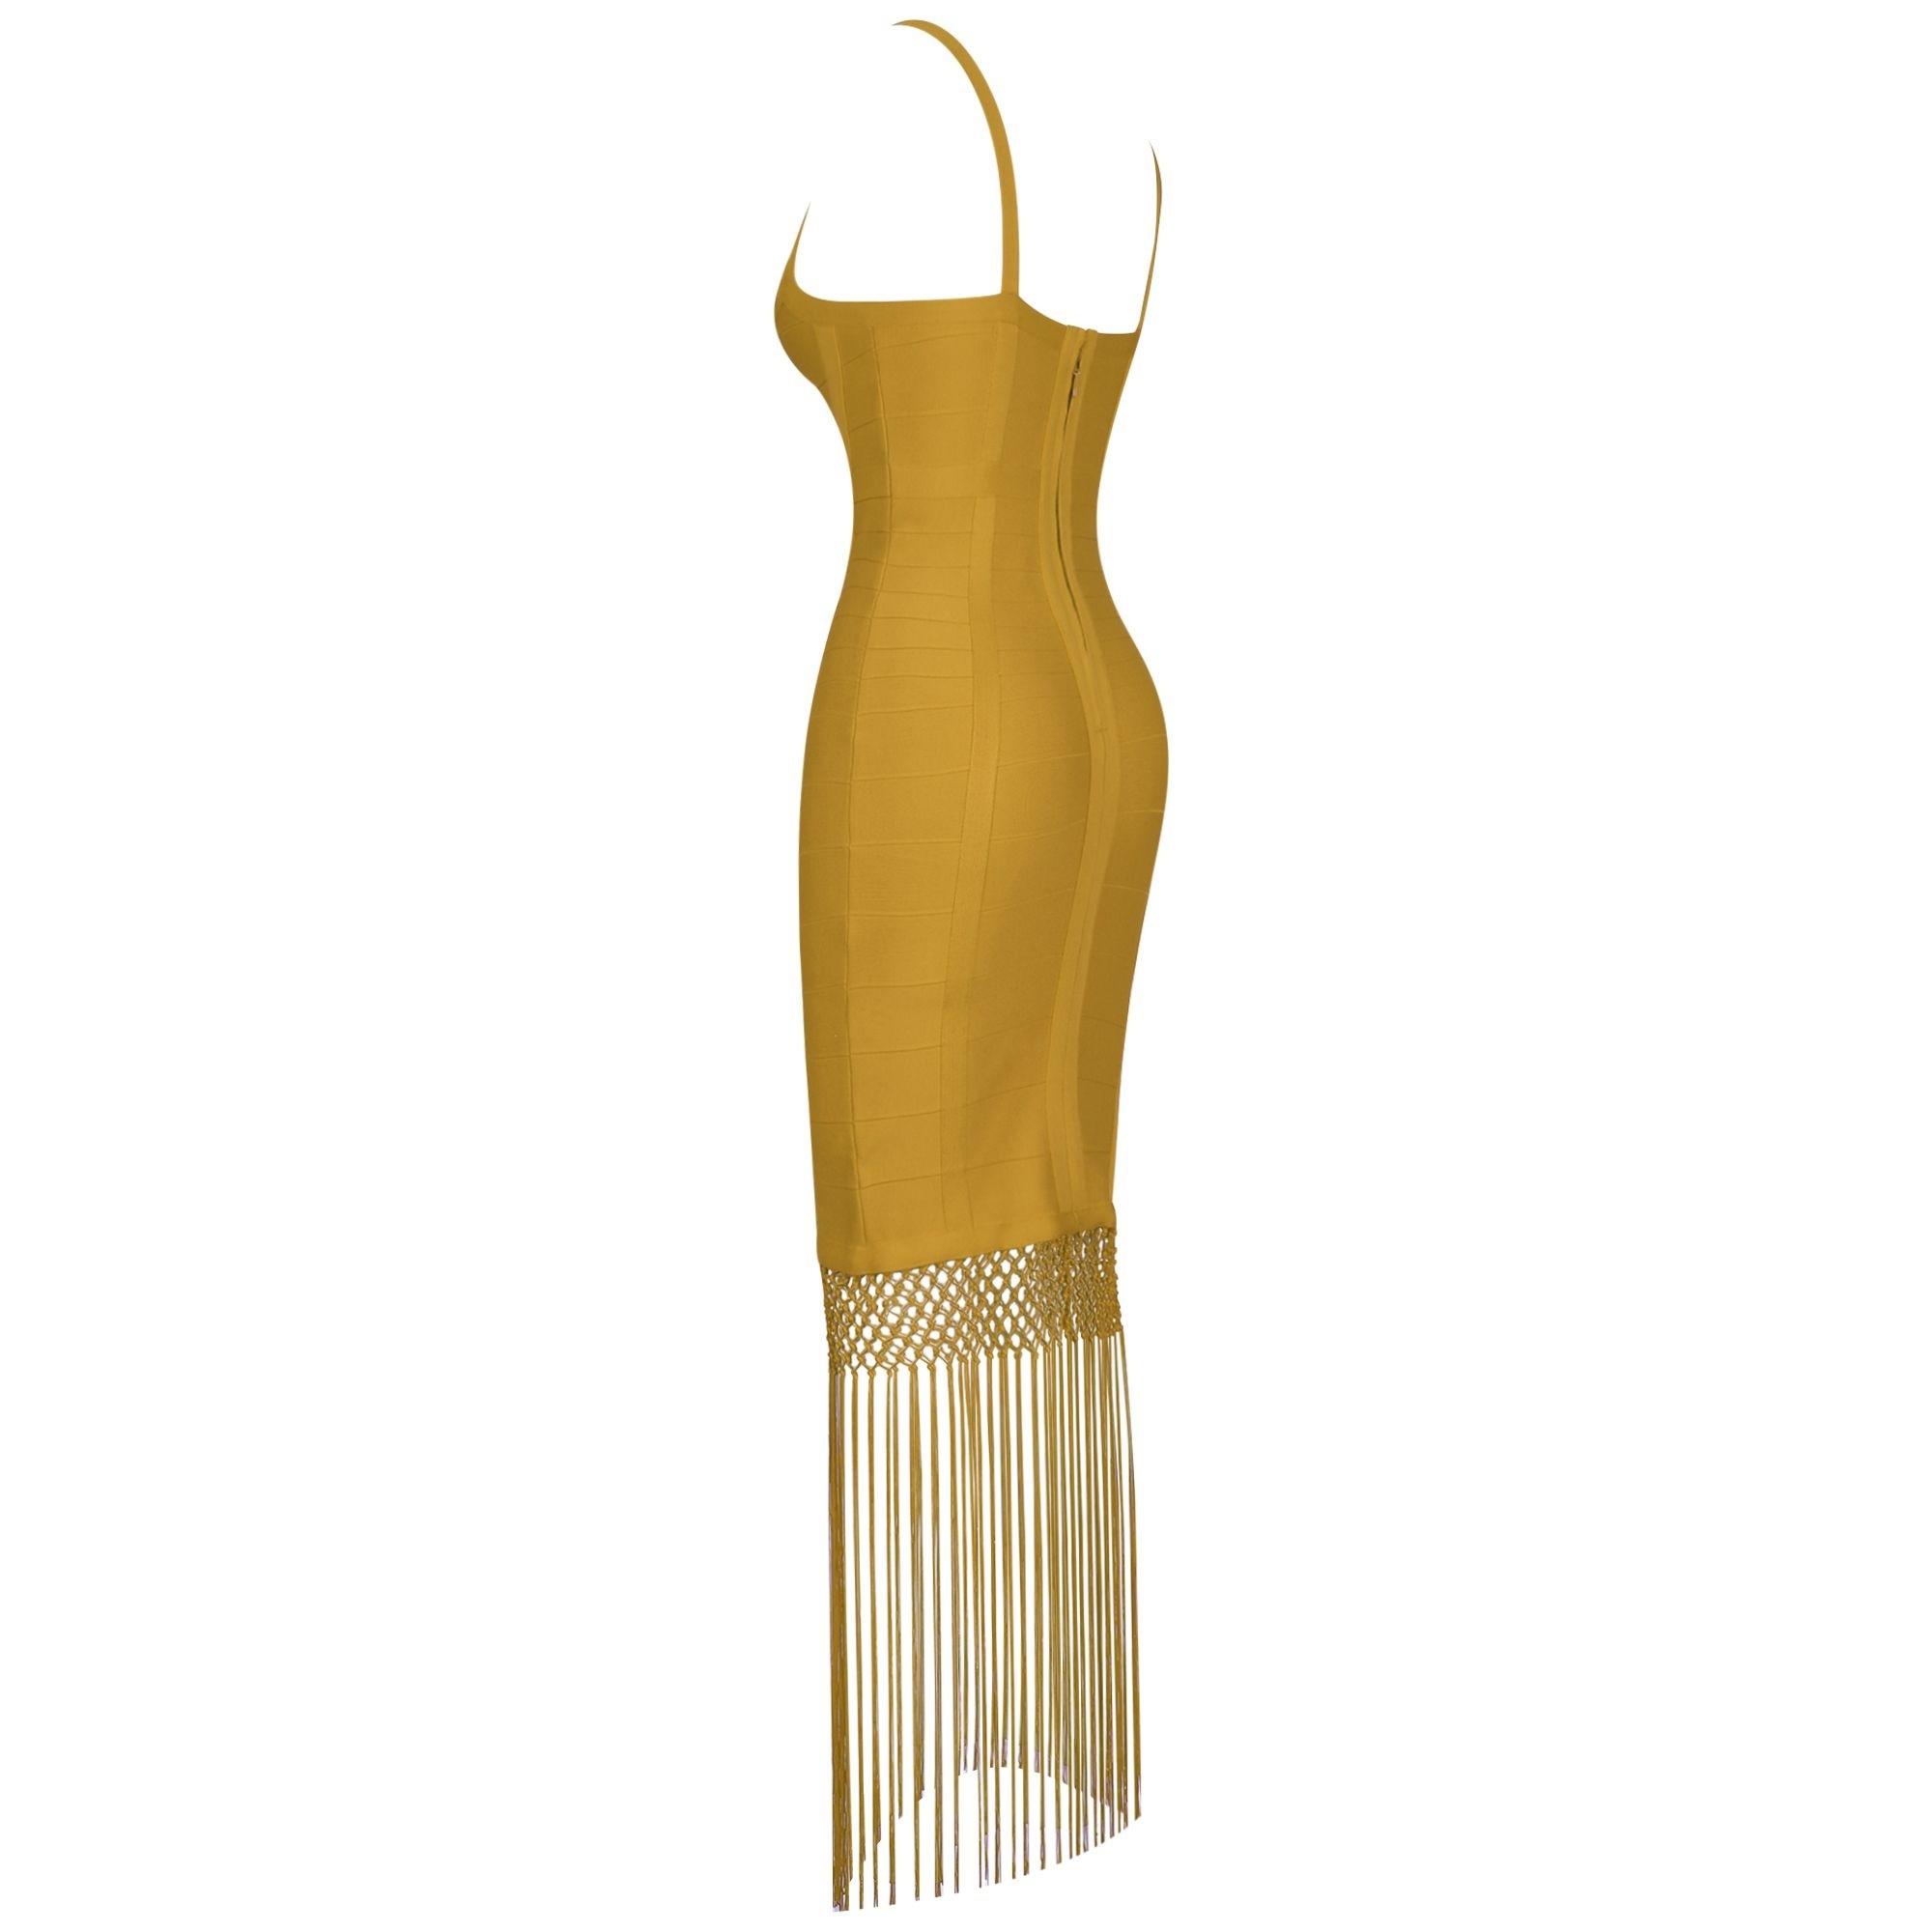 Ginger Tassels Maxi Sleeveless Strapy Bandage Dress PF19043-Ginger